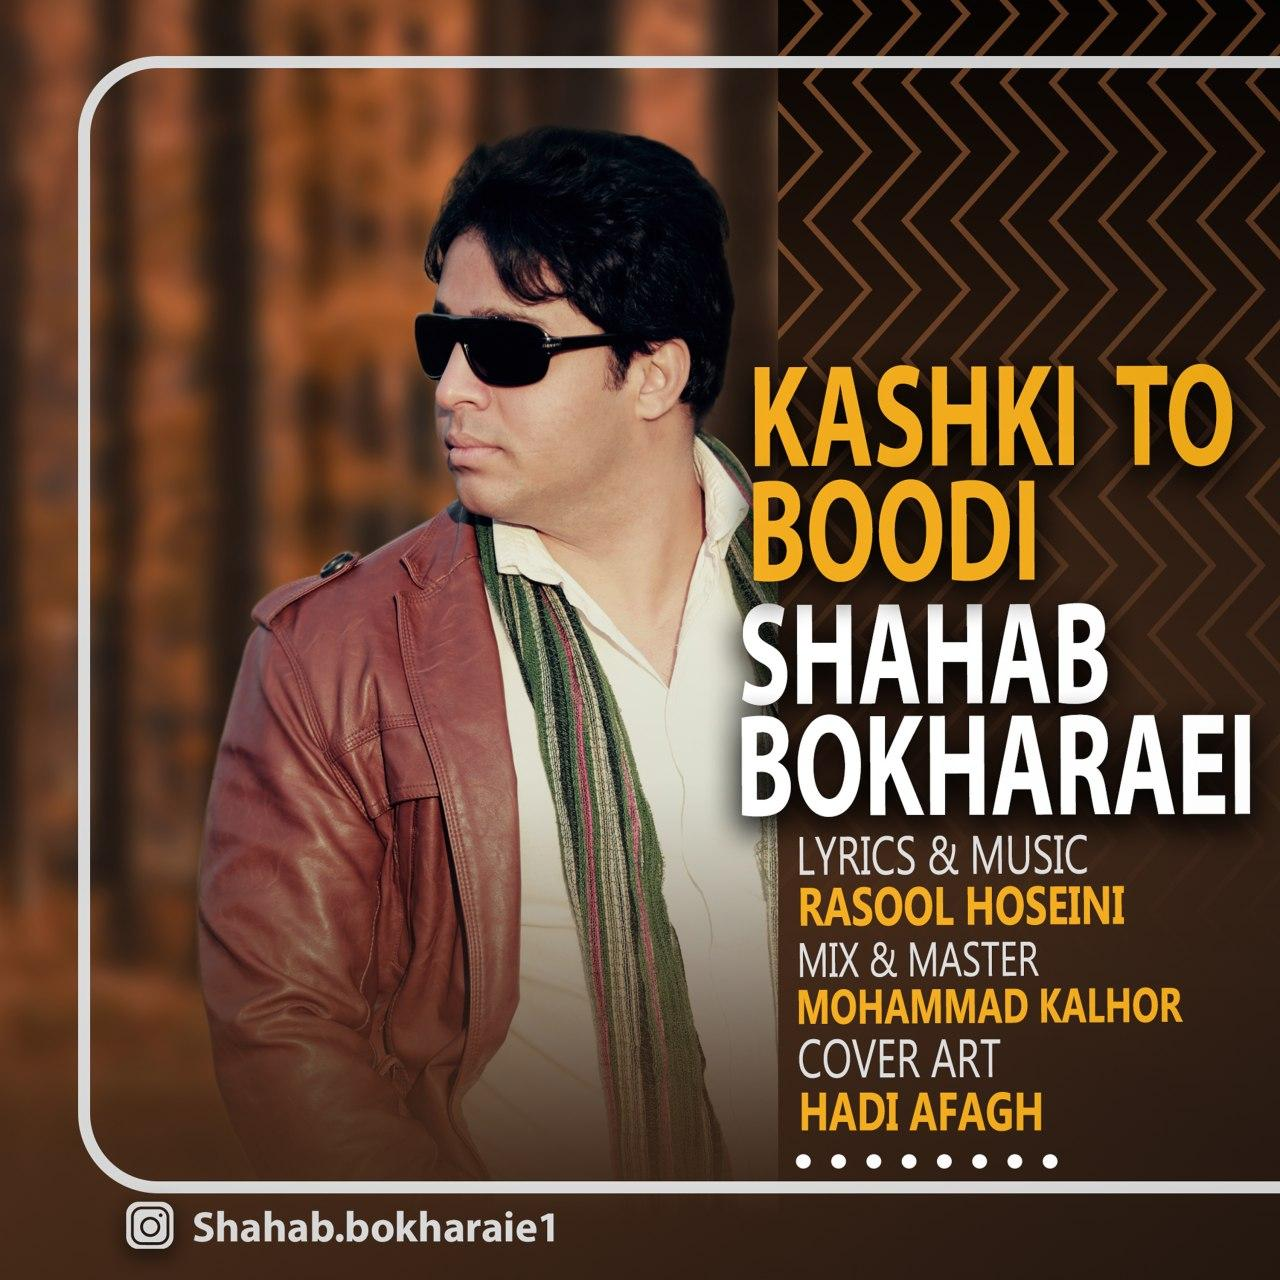 Shahab Bokharaei – Kashki To Boodi